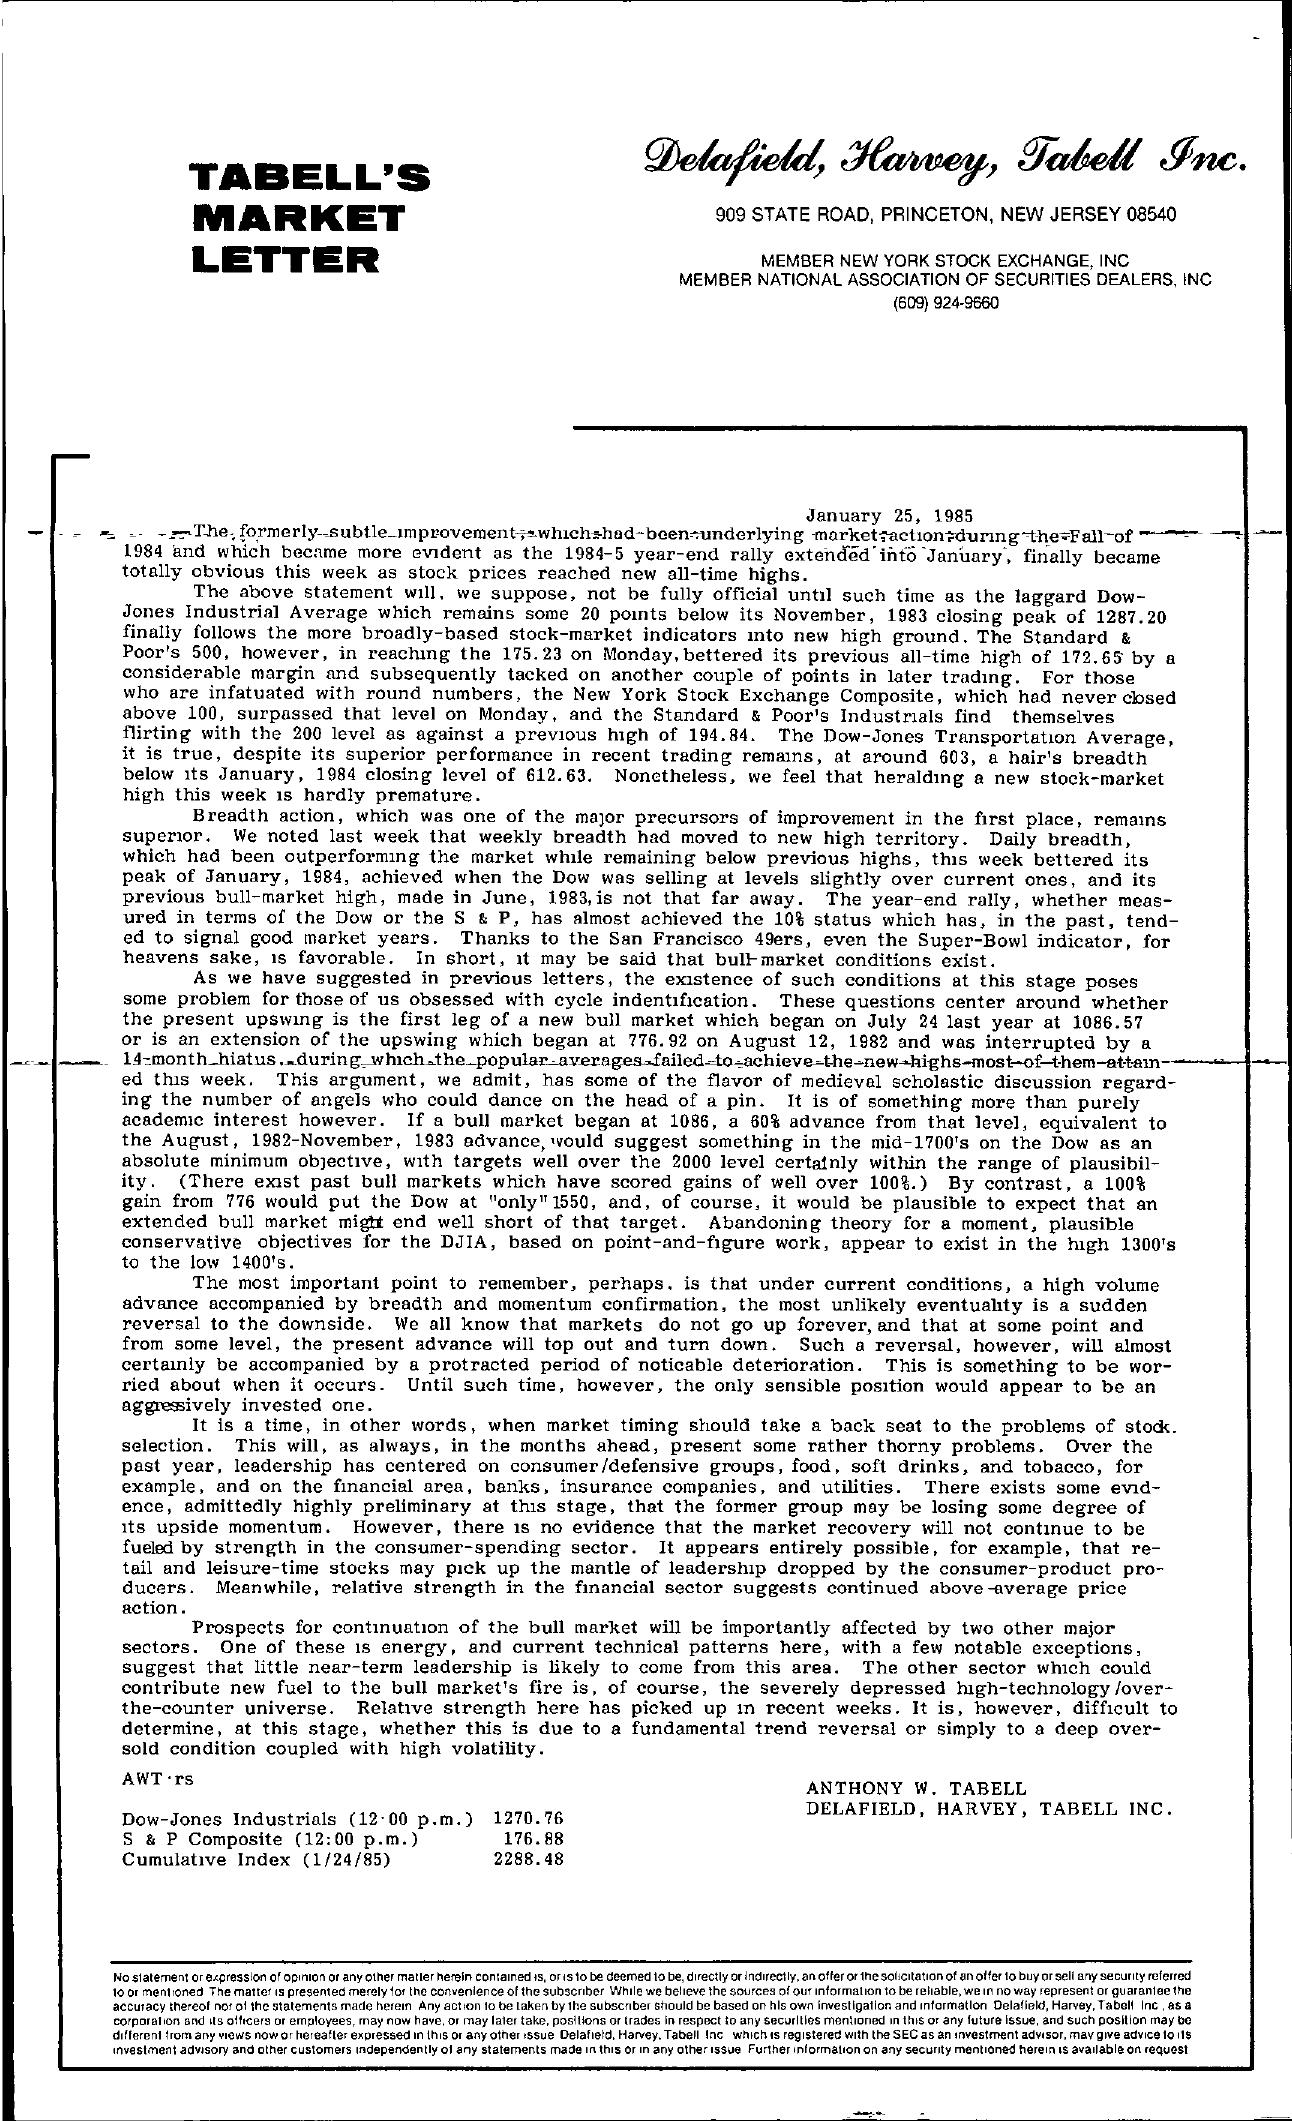 Tabell's Market Letter - January 25, 1985